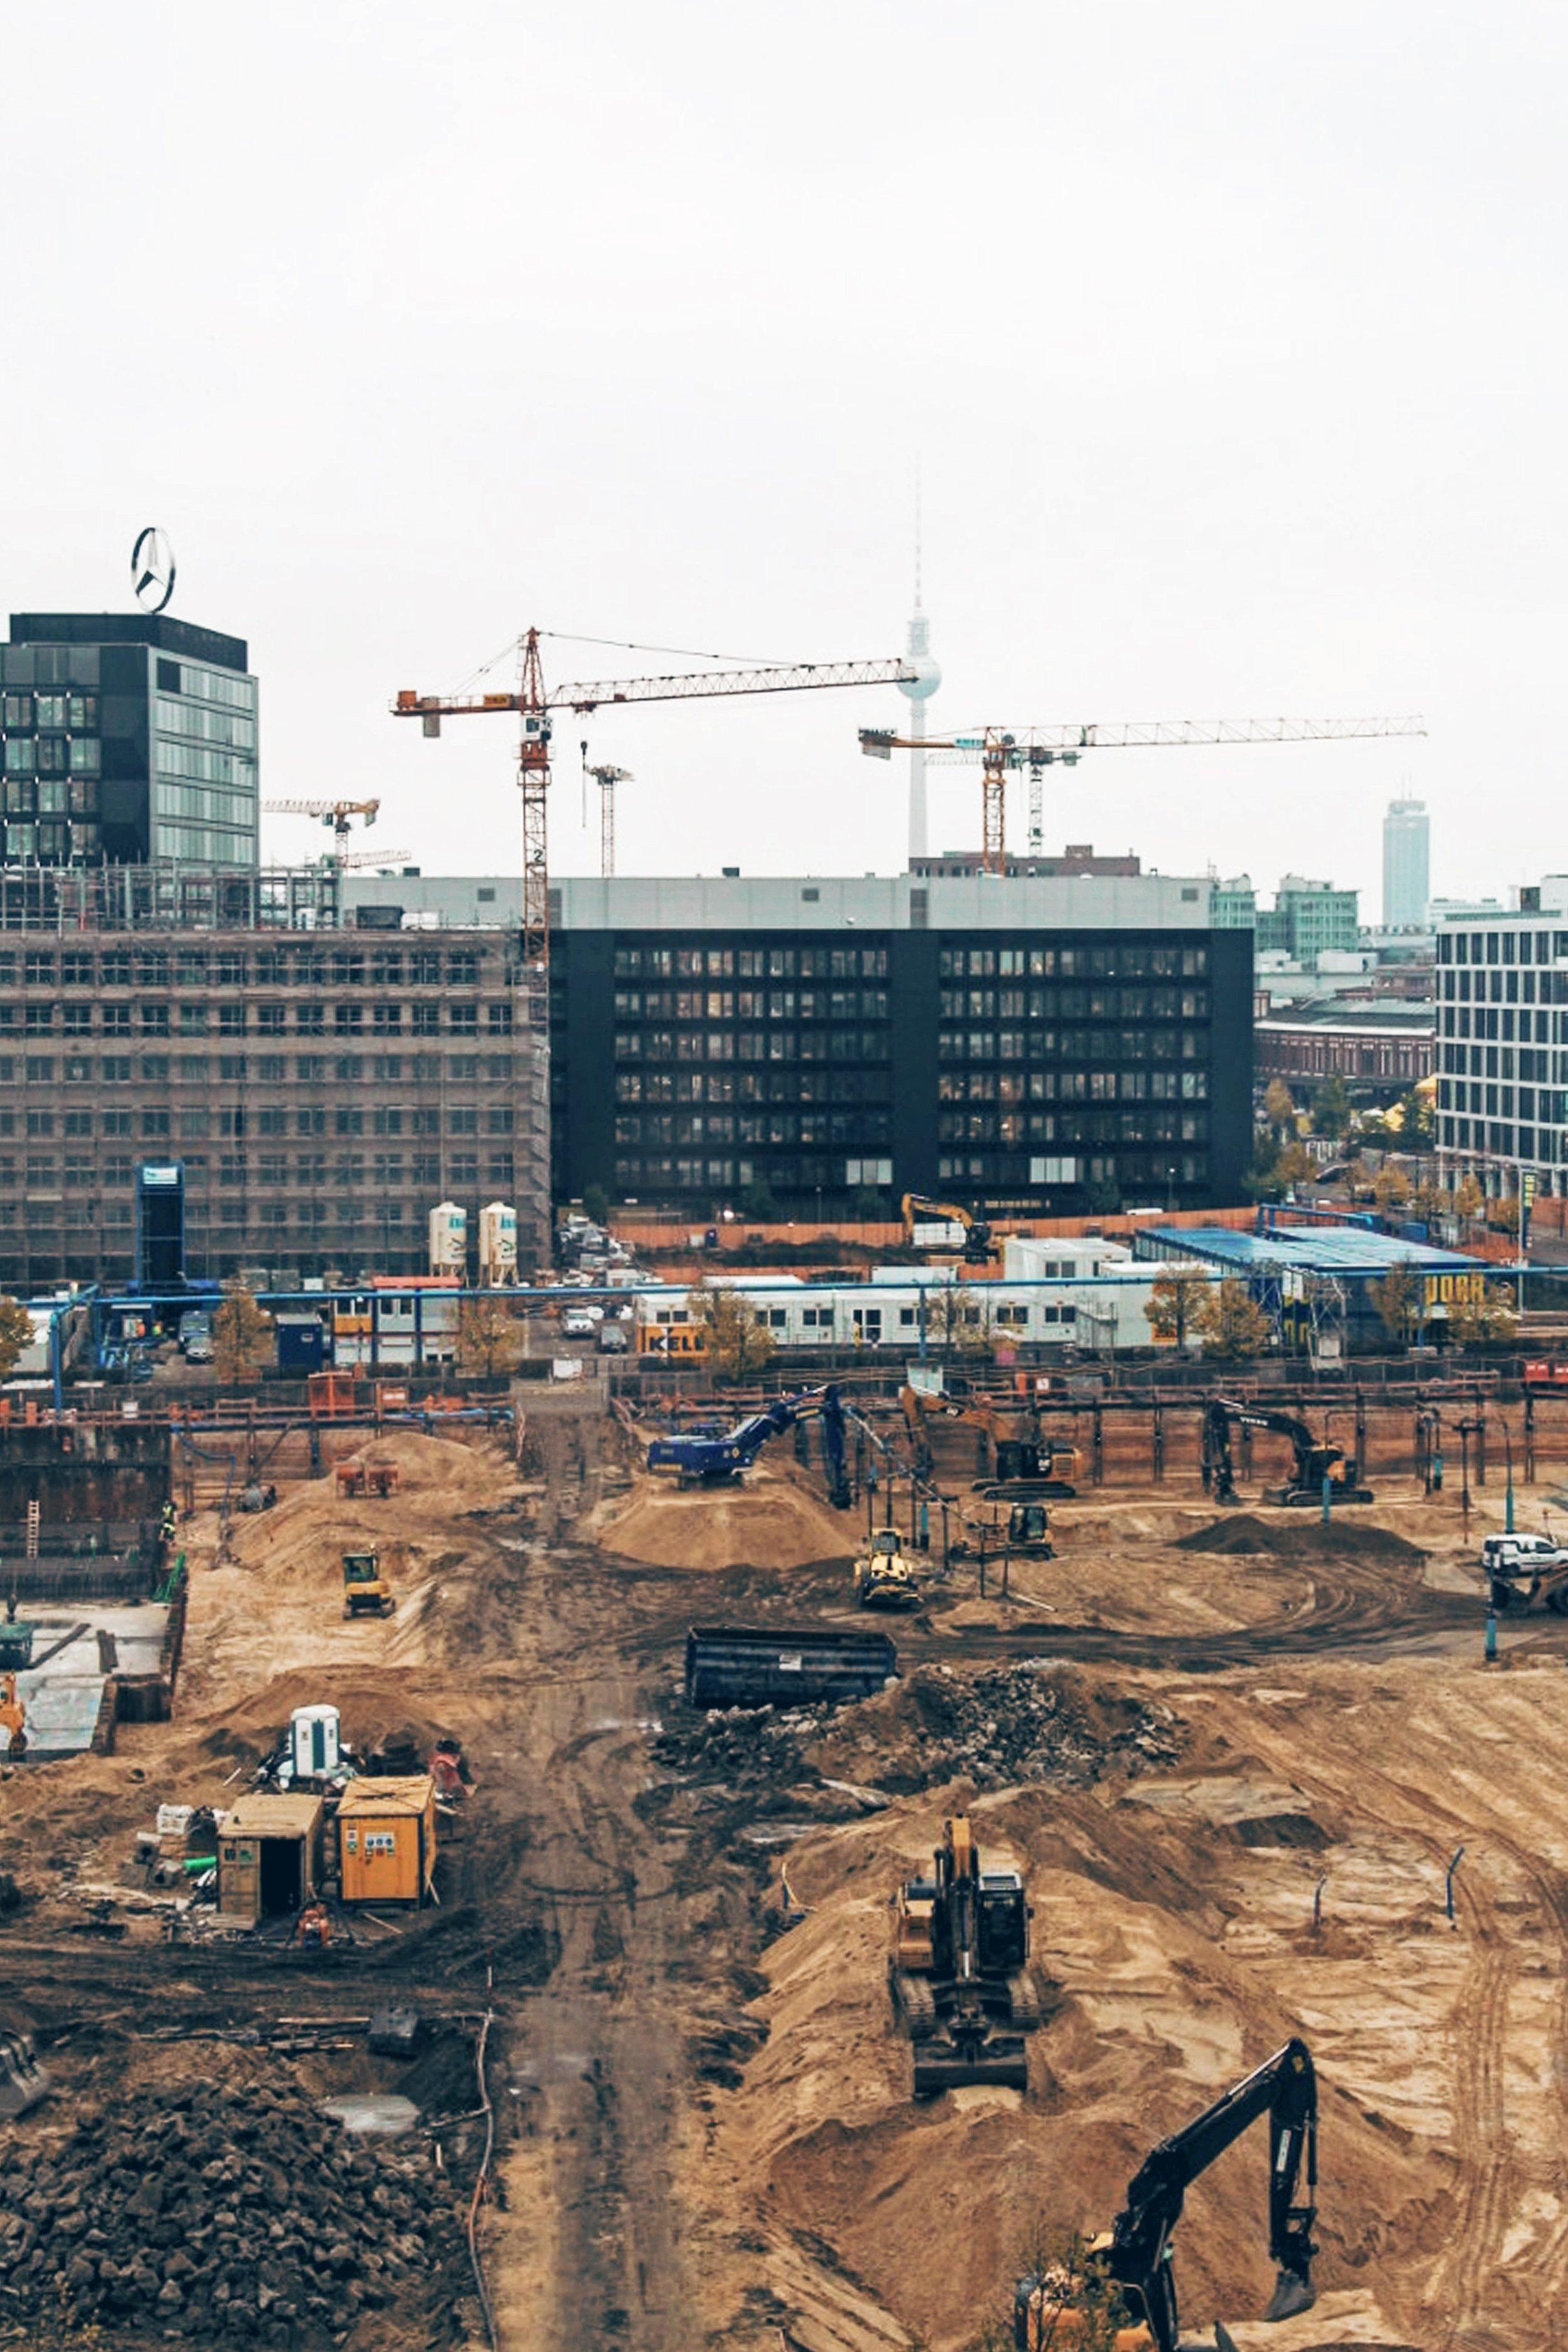 Berlin - the city of cranes